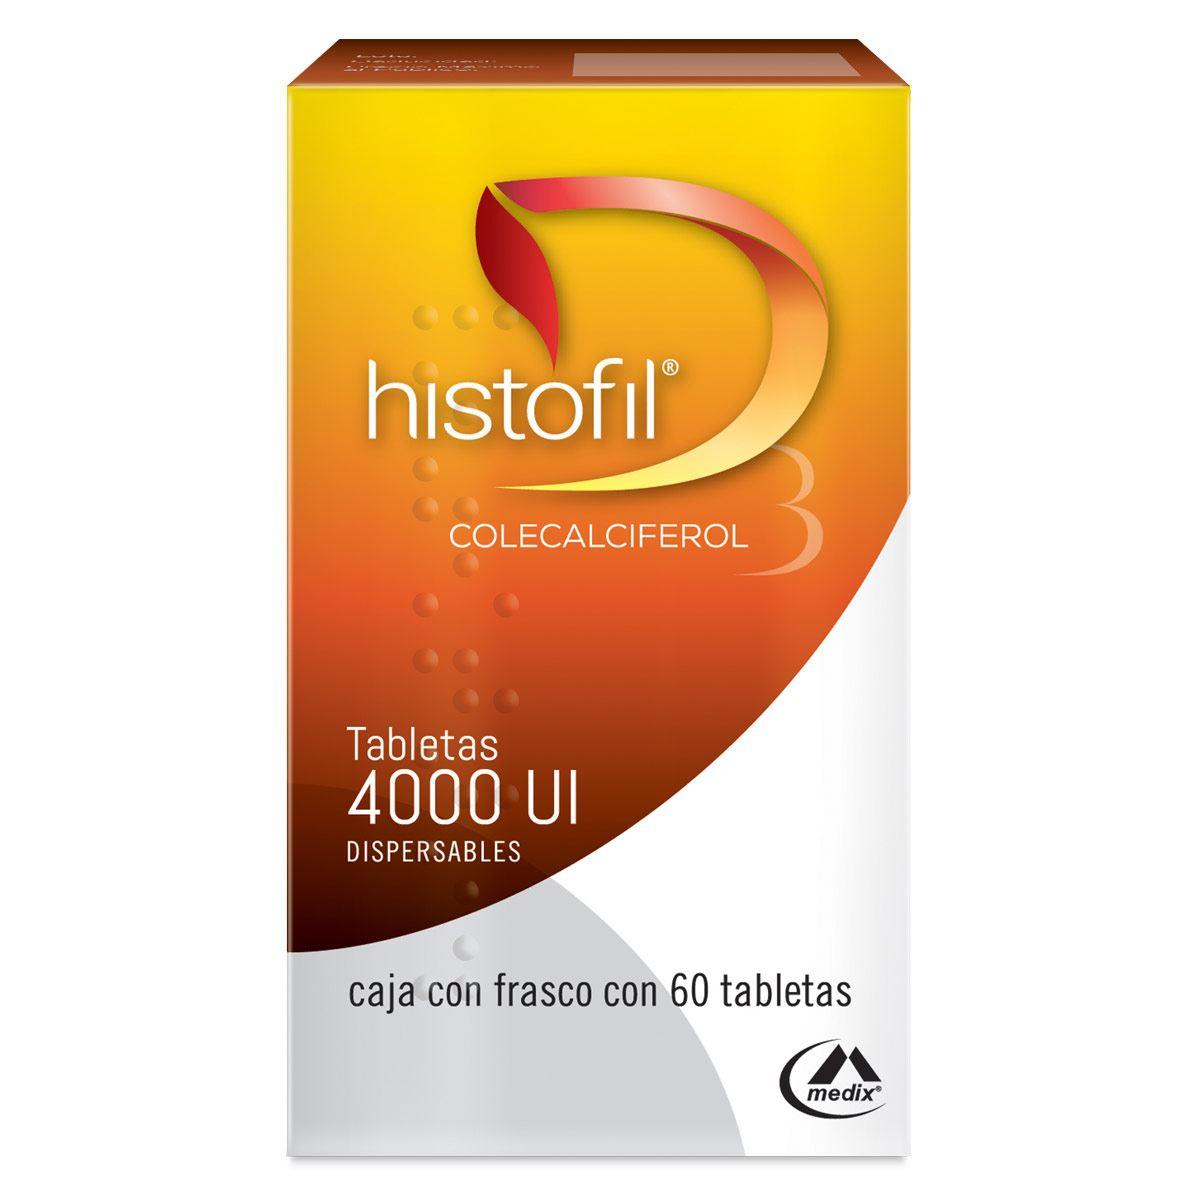 Histofil 4000 UI (vitamina D3) frasco con 60 tabletas. Colecalciferol.